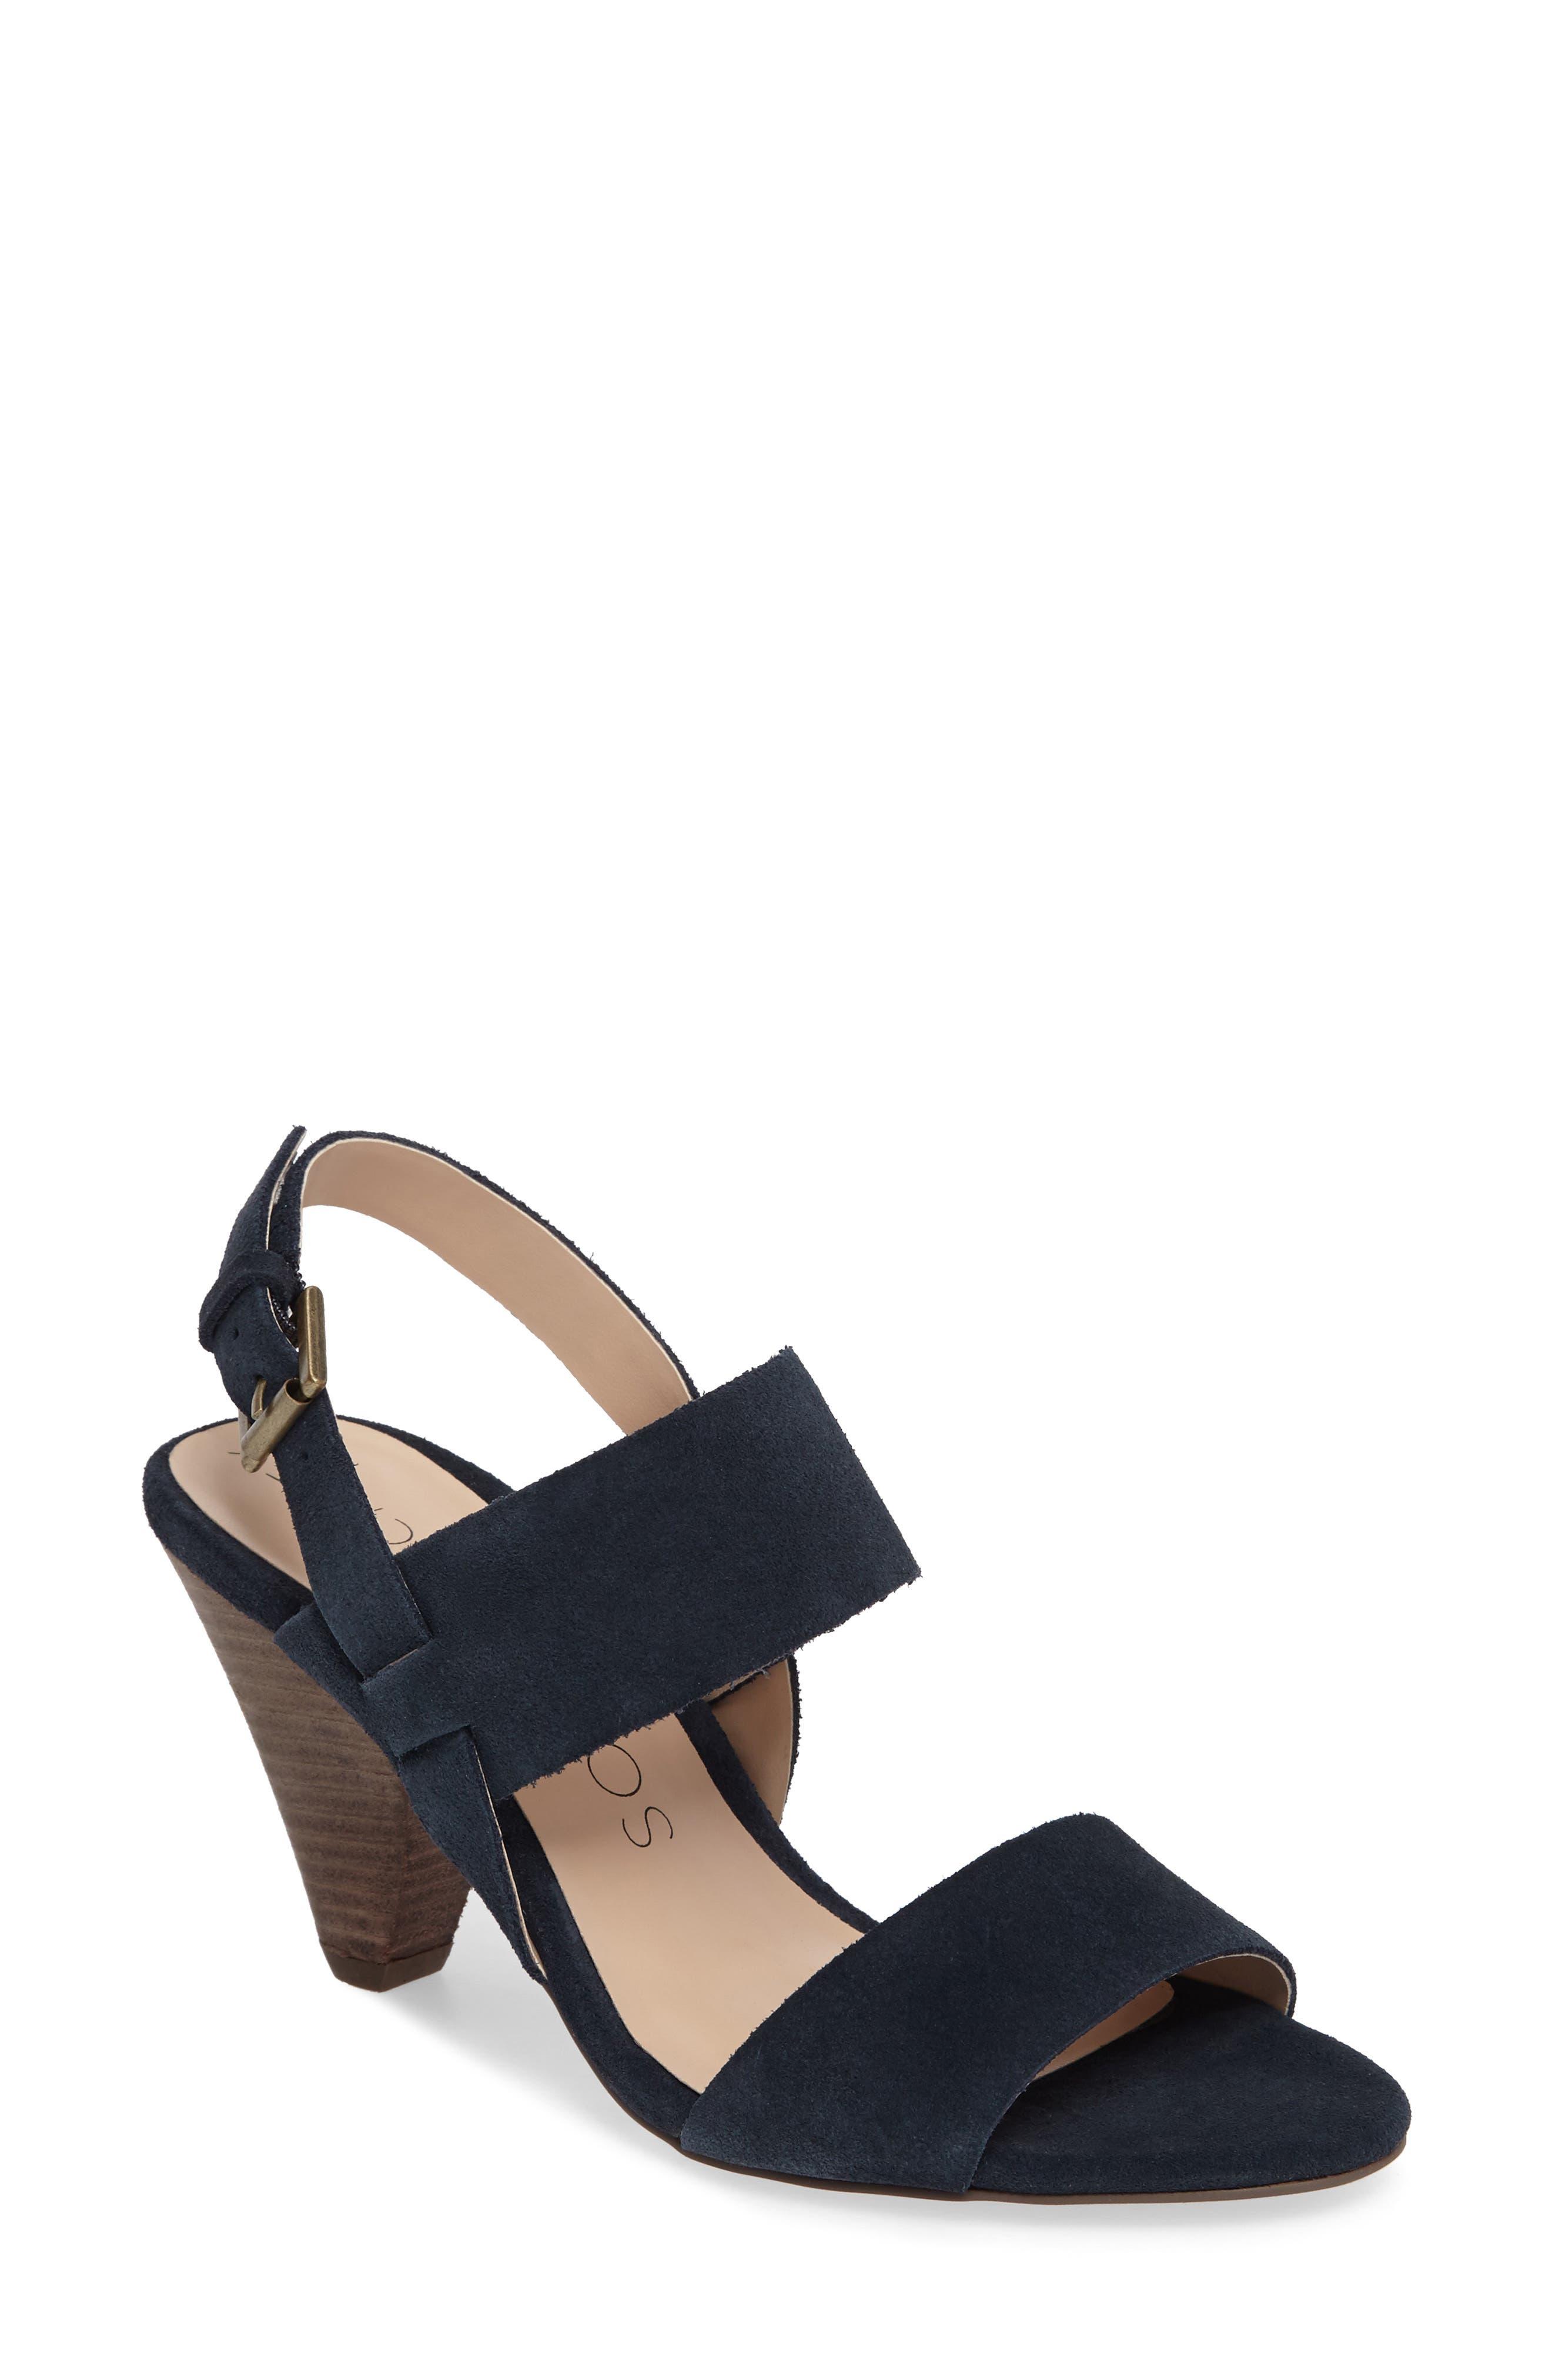 Alternate Image 1 Selected - Sole Society Valor Cone Heel Sandal (Women)